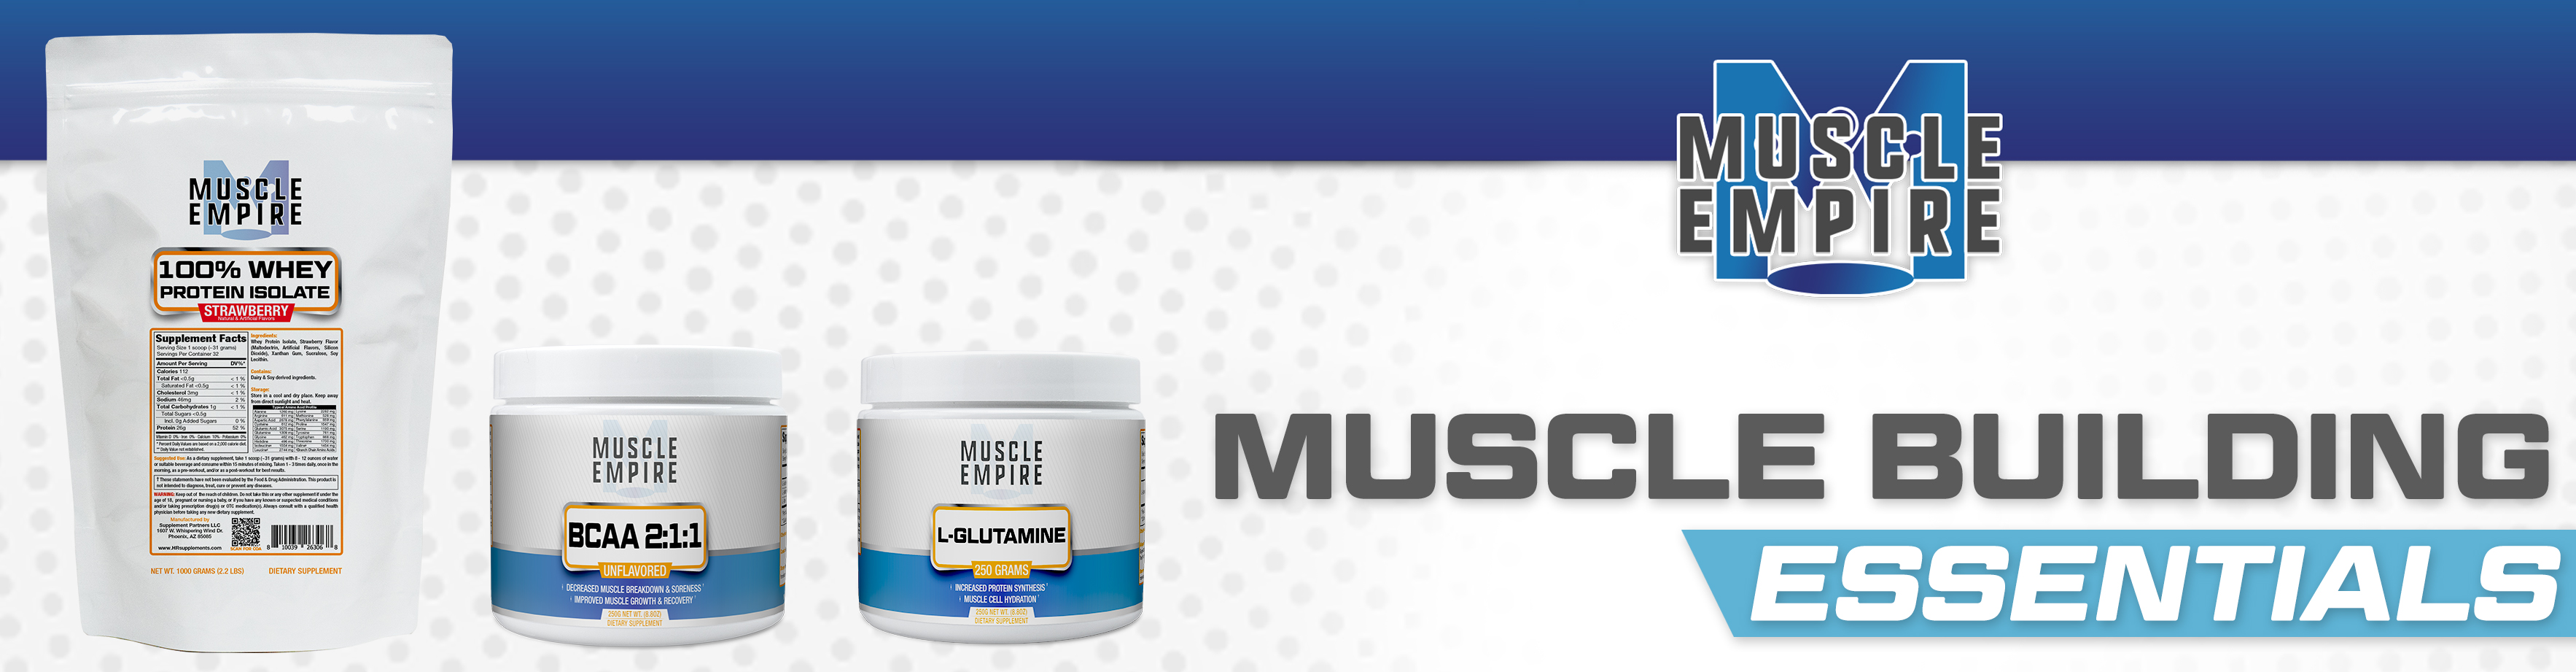 muscle-building-essentials.jpg